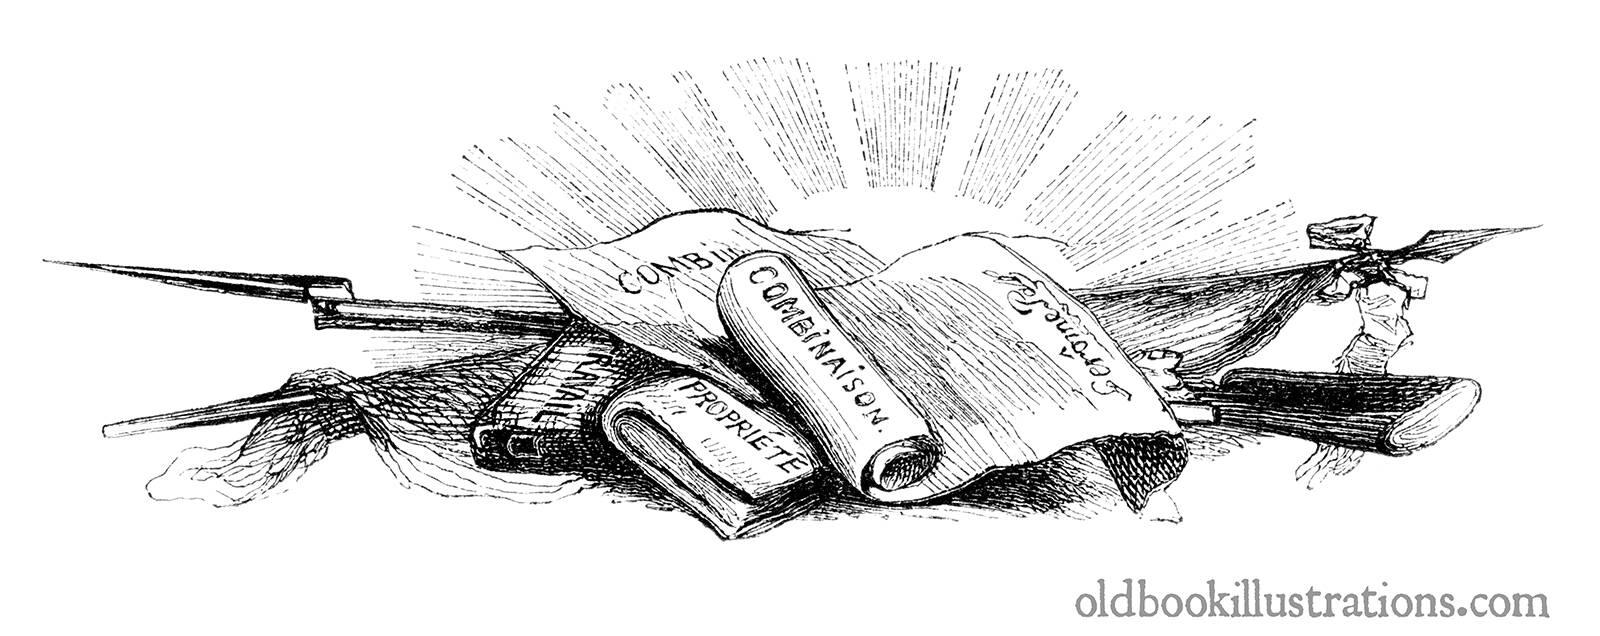 vignette-with-scrolls-1600.jpg (1600×636)